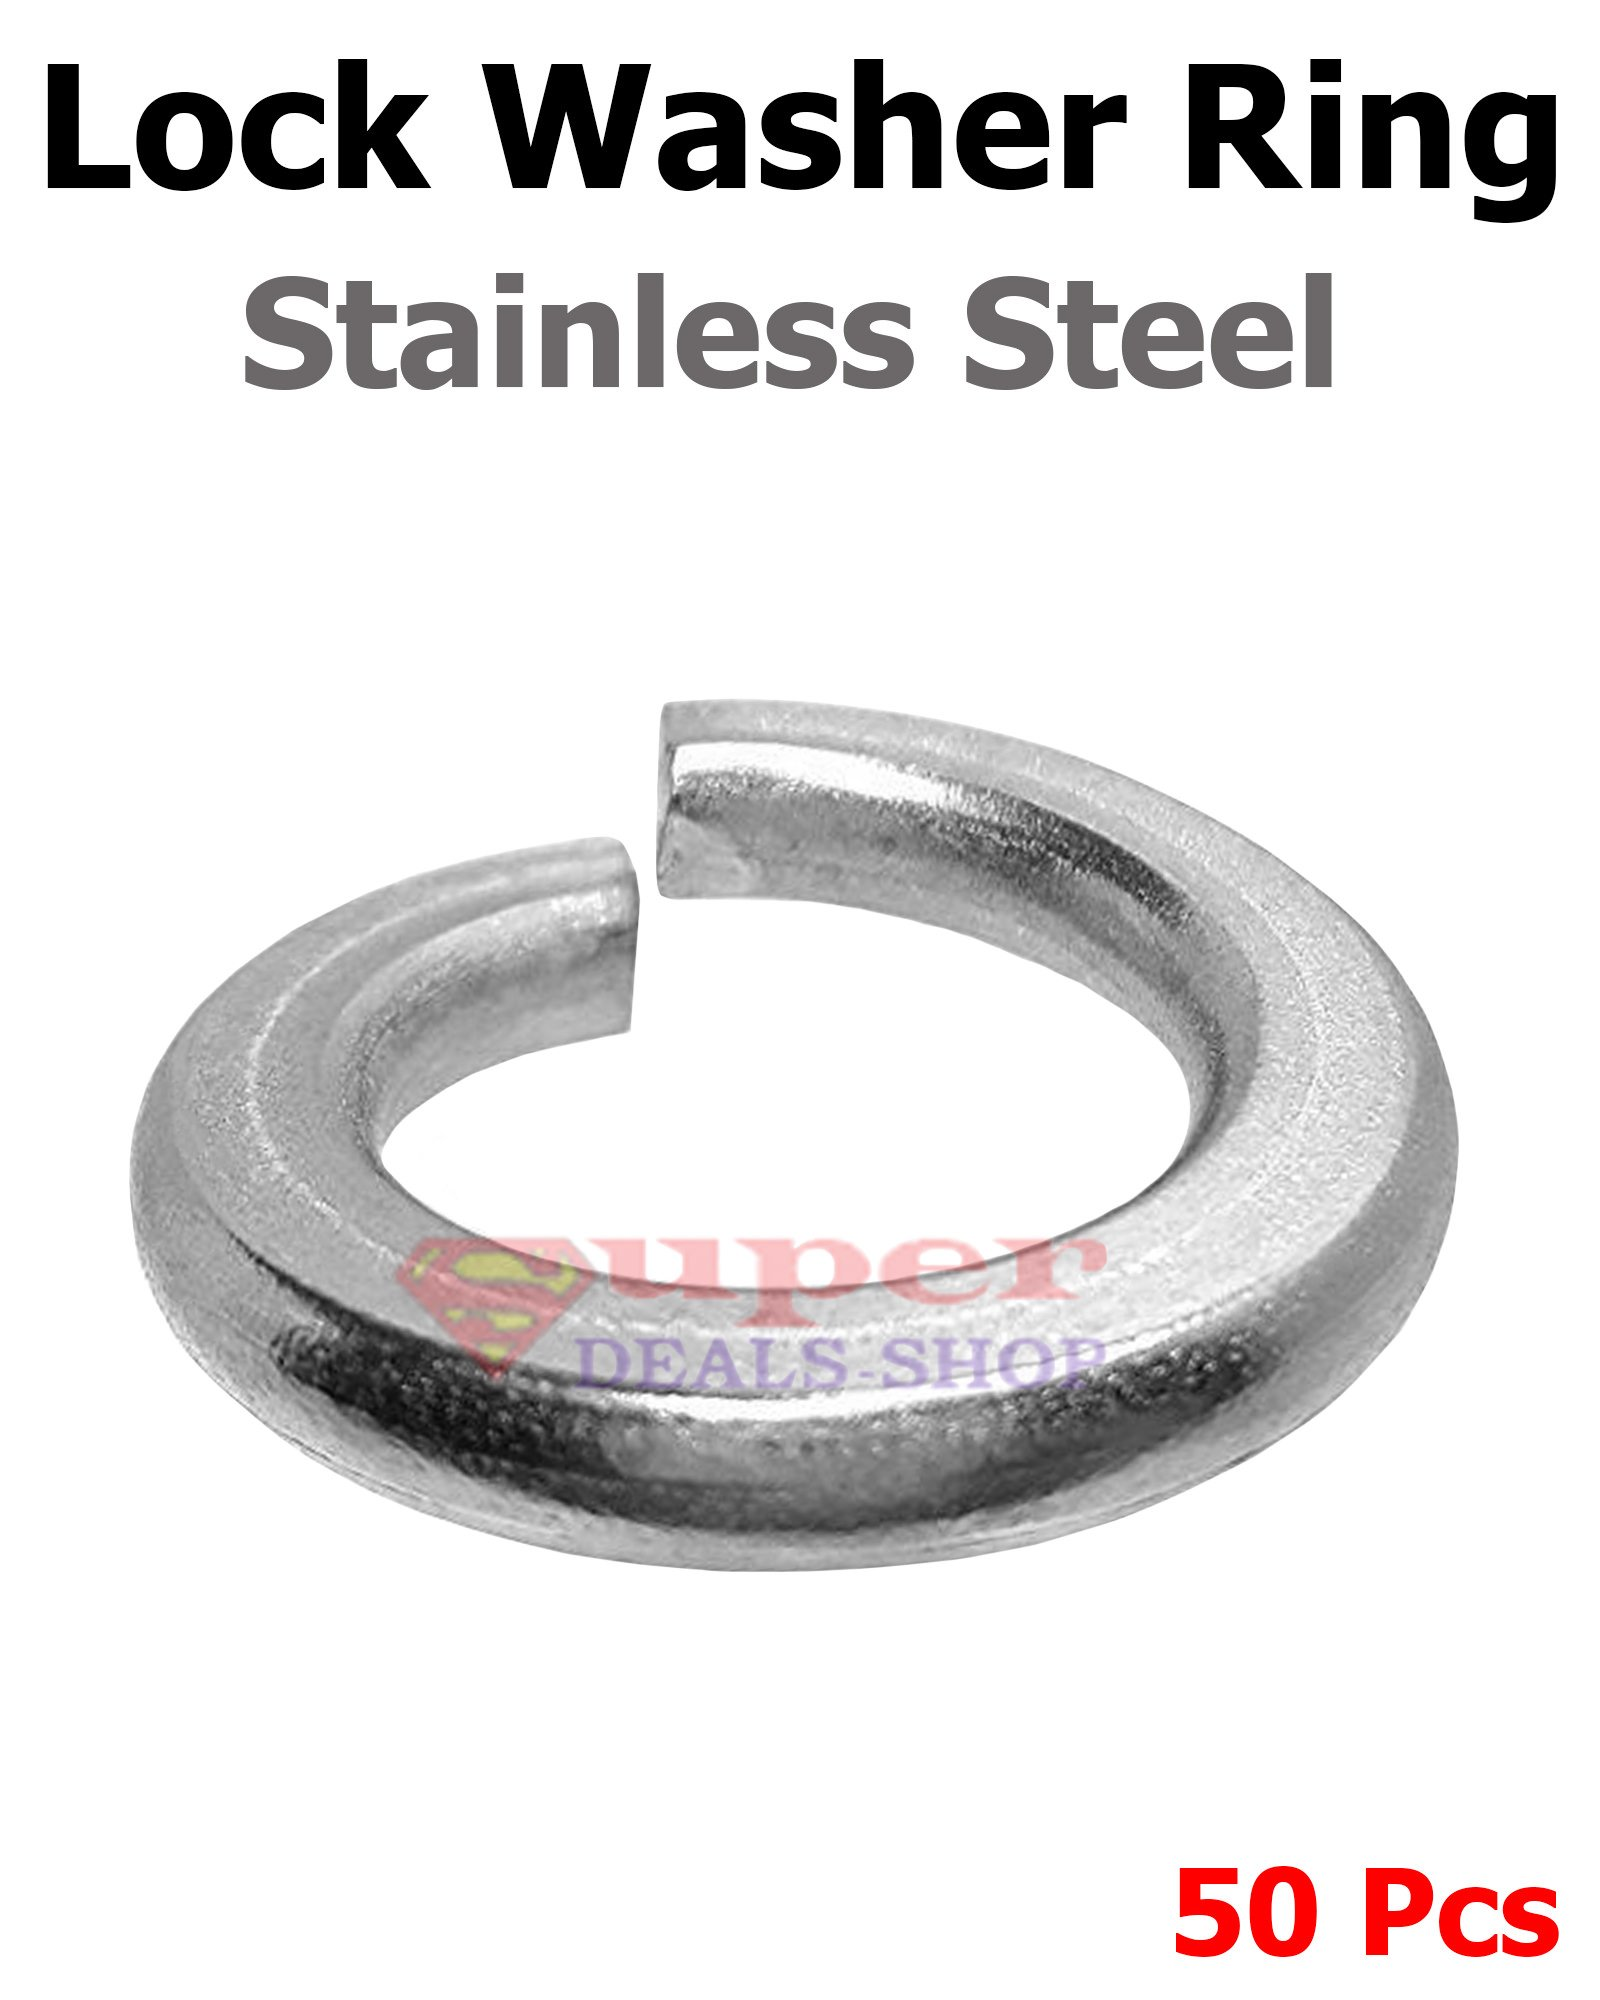 50 Pcs 9/16 Stainless Steel Medium Split Lock Washer Split Ring Super-Deals-Shop